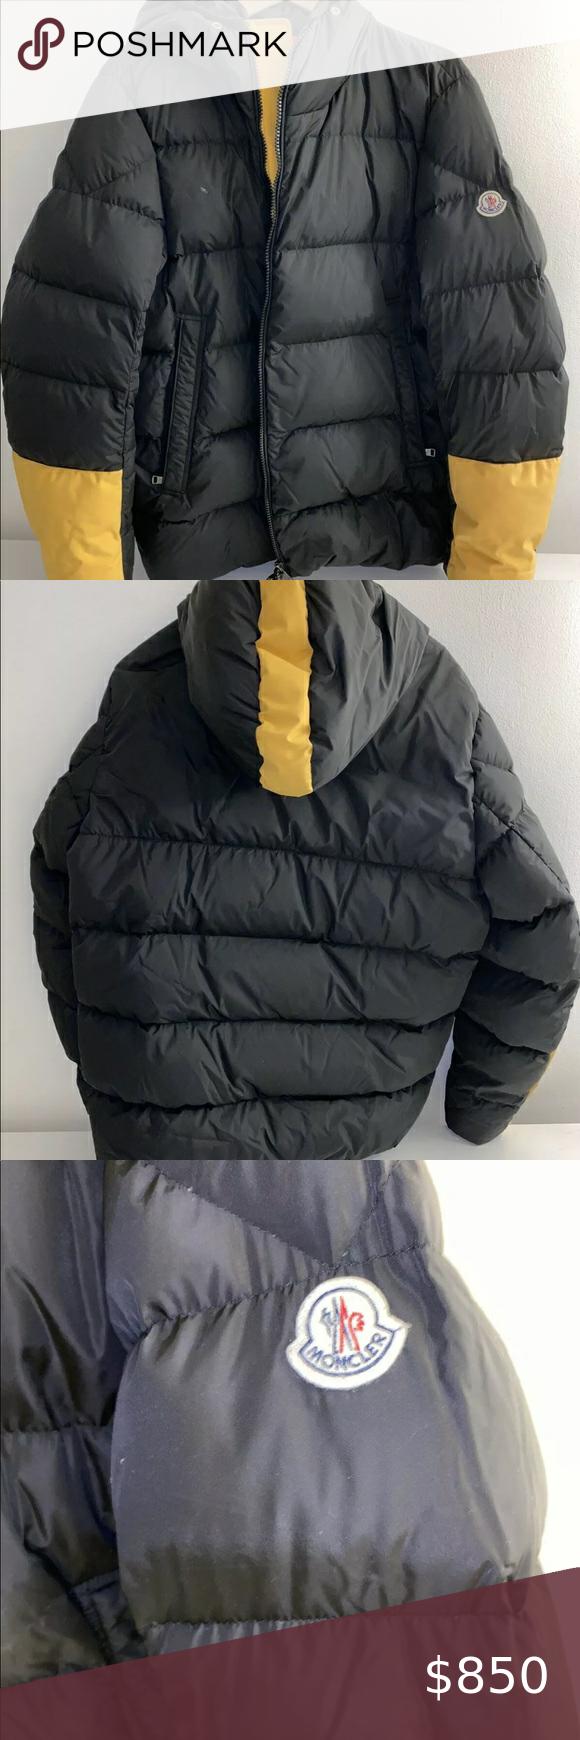 Moncler Jacket Drake Giubbotto Size 6 Xl Moncler Jacket Drake Giubbotto Size 6 Xl Good Condition Had Small Hole On Chest Moncler Jacket Fur Hood Jacket Jackets [ 1740 x 580 Pixel ]